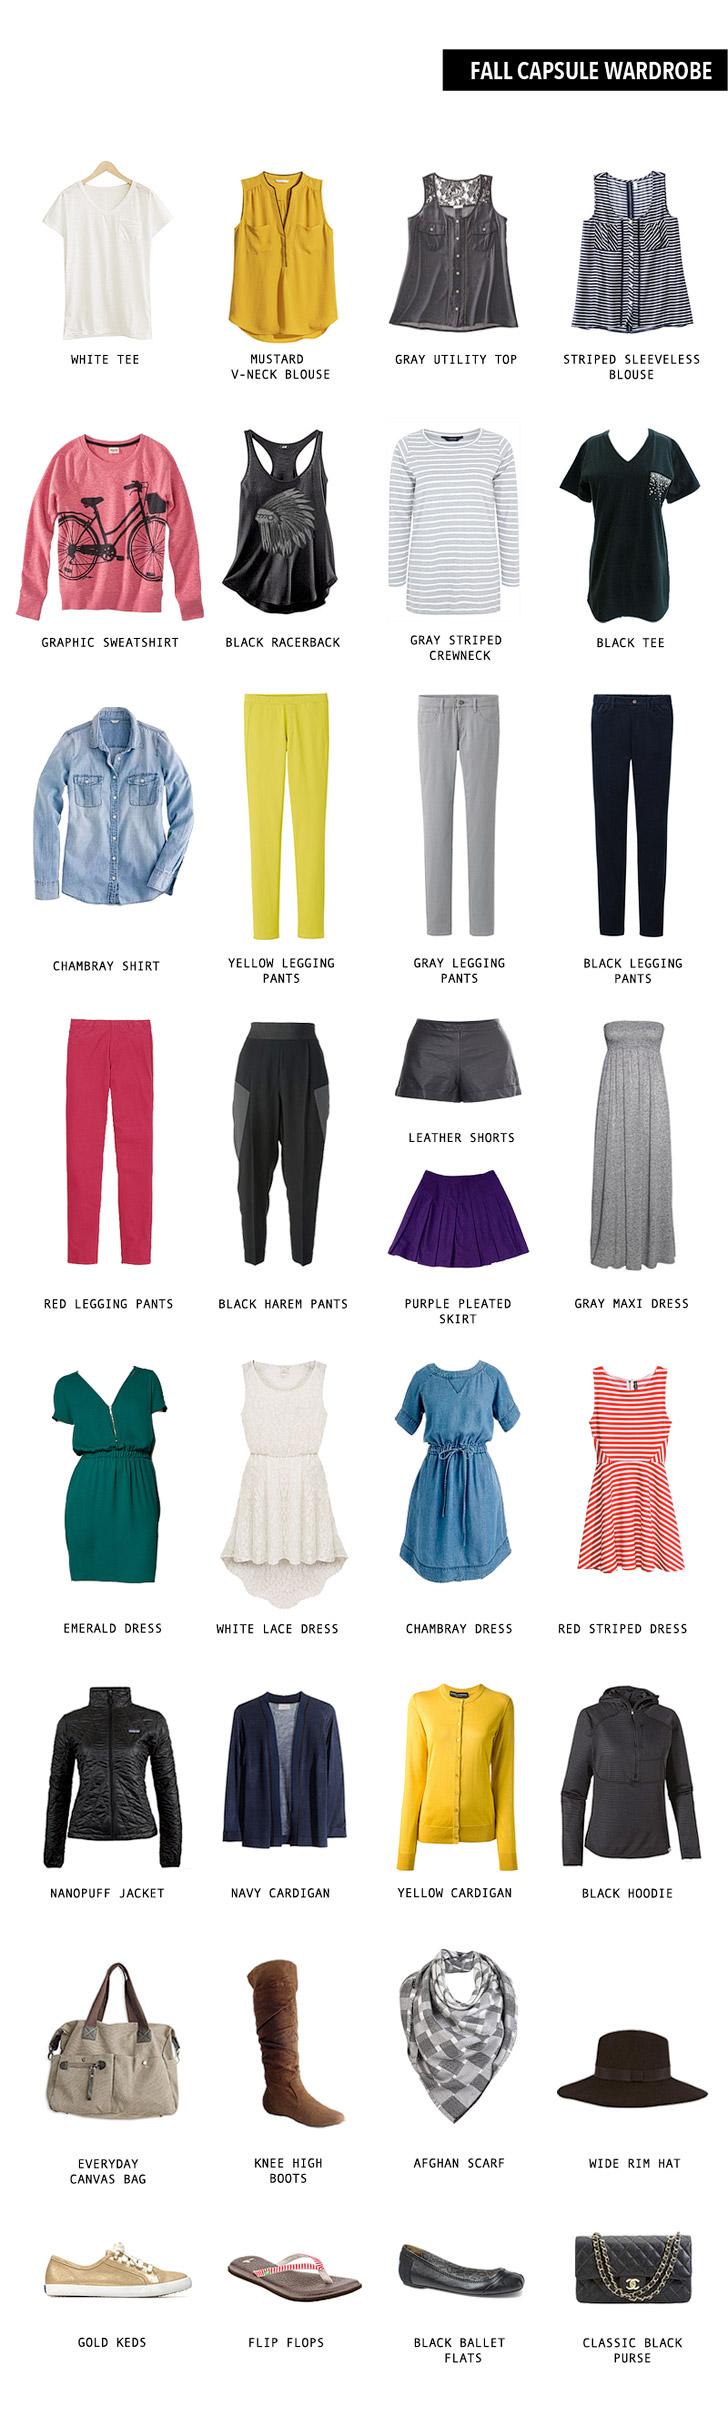 Project 333 / Fall Capsule Wardrobe.